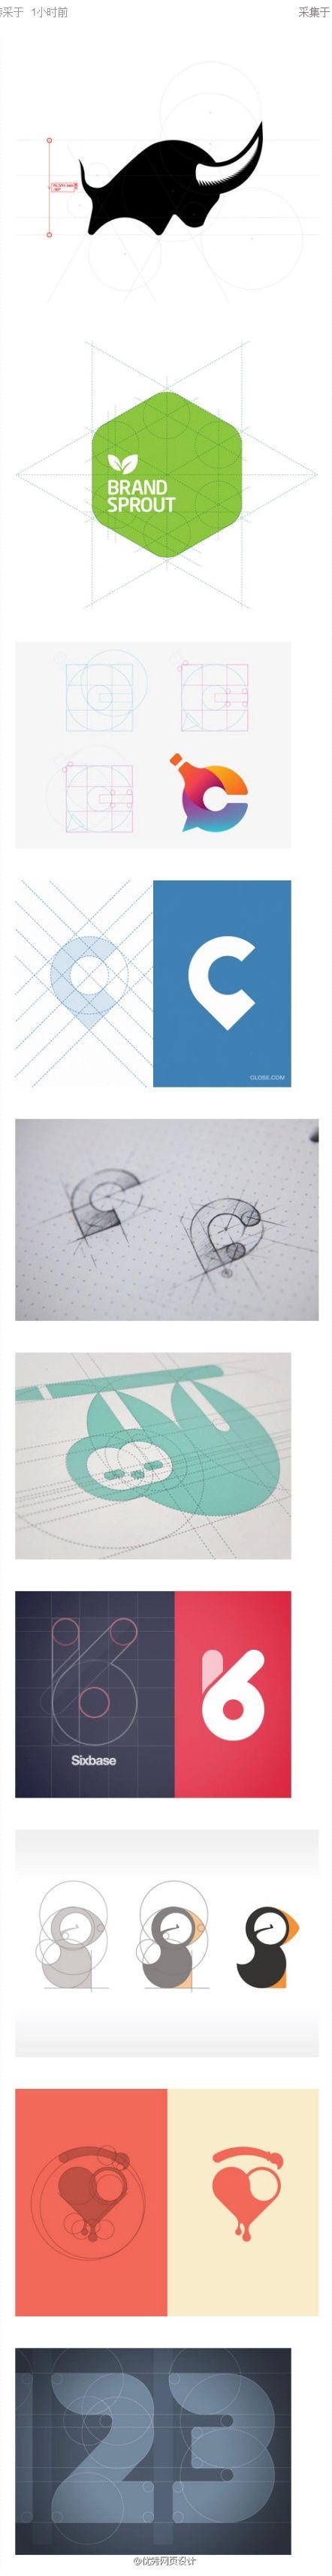 Best Graphic Design Company  Custom Logos Print Web